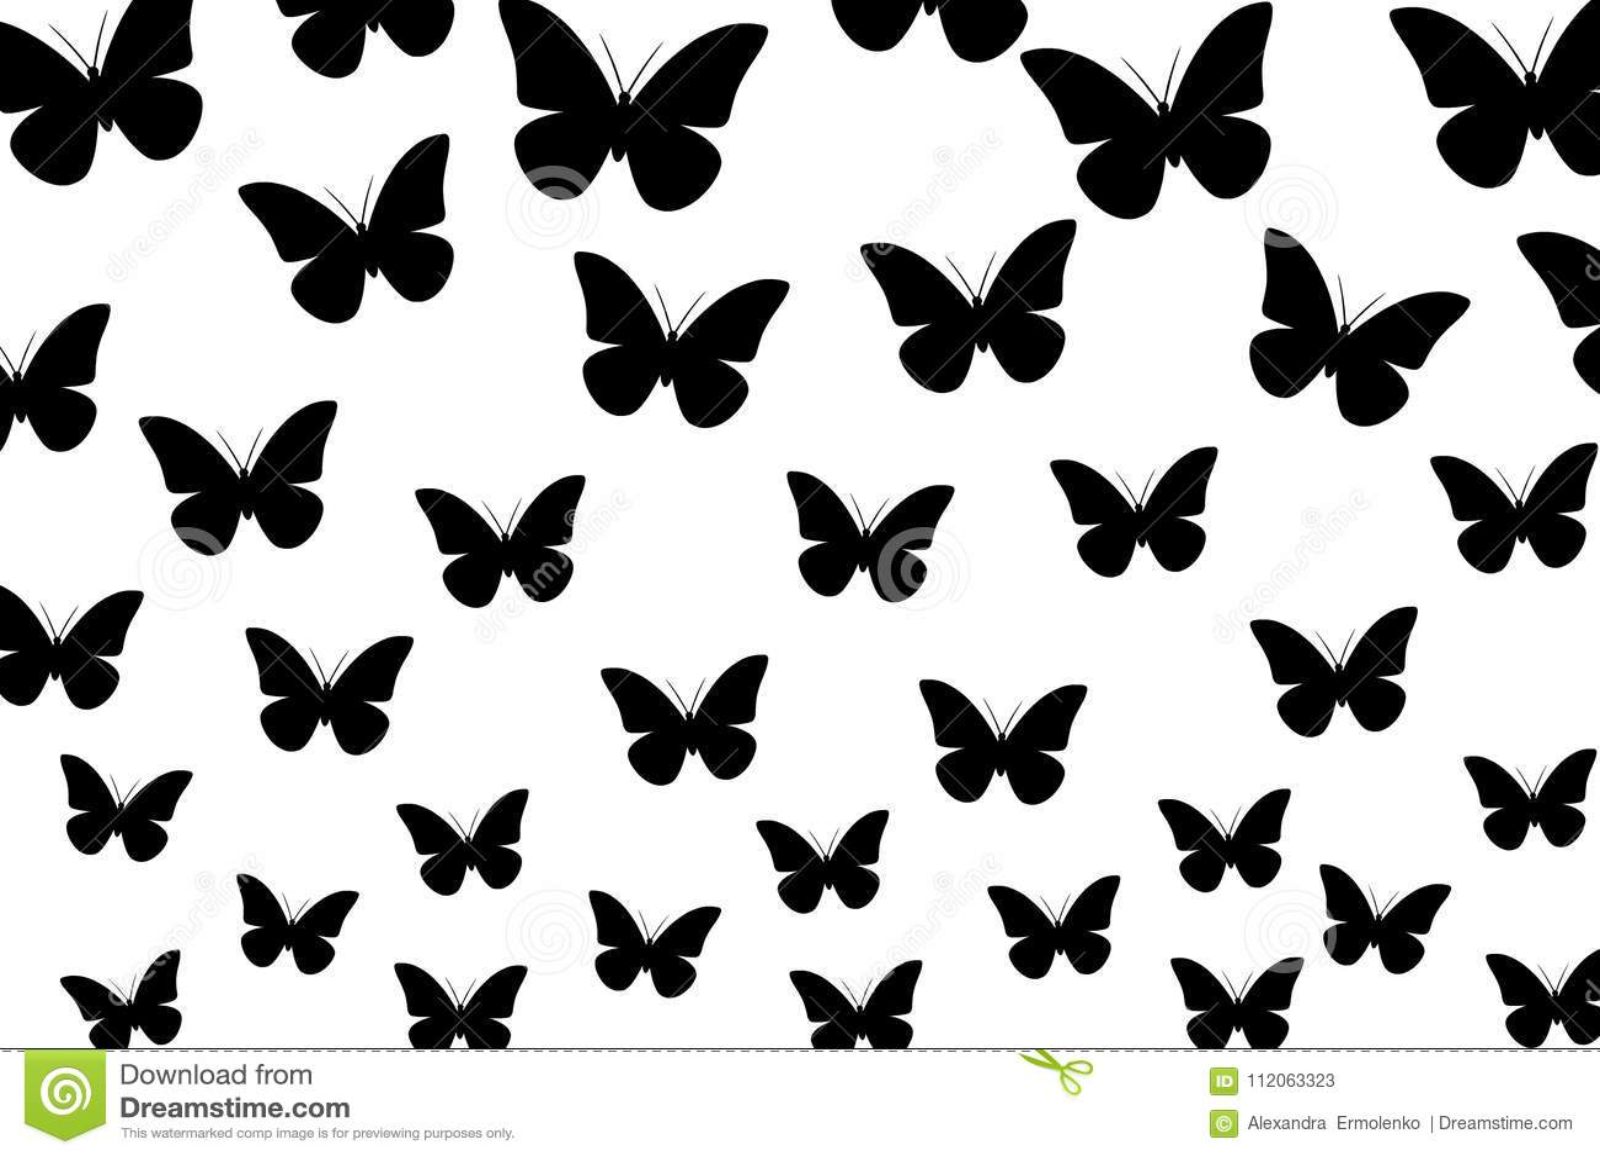 Black Butterflies On White Background Seamless Wallpaper Illustration Vector Stock Illustration Illustration Of Vector Place 112063323